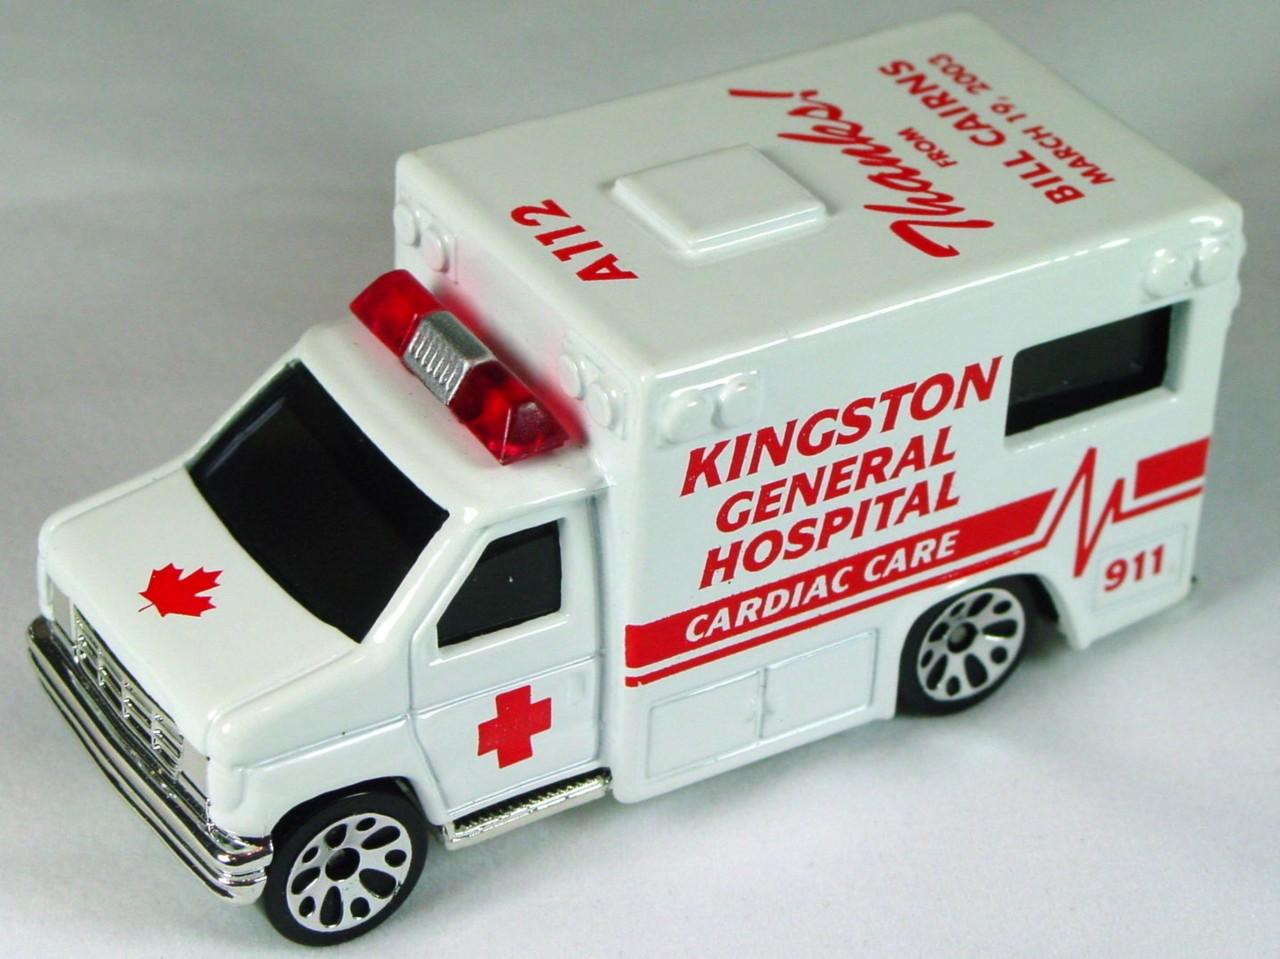 ASAP-CCI 51 K 46 - Ford Amb White Kingston Cardiac Hosp Bill Cairns CCI